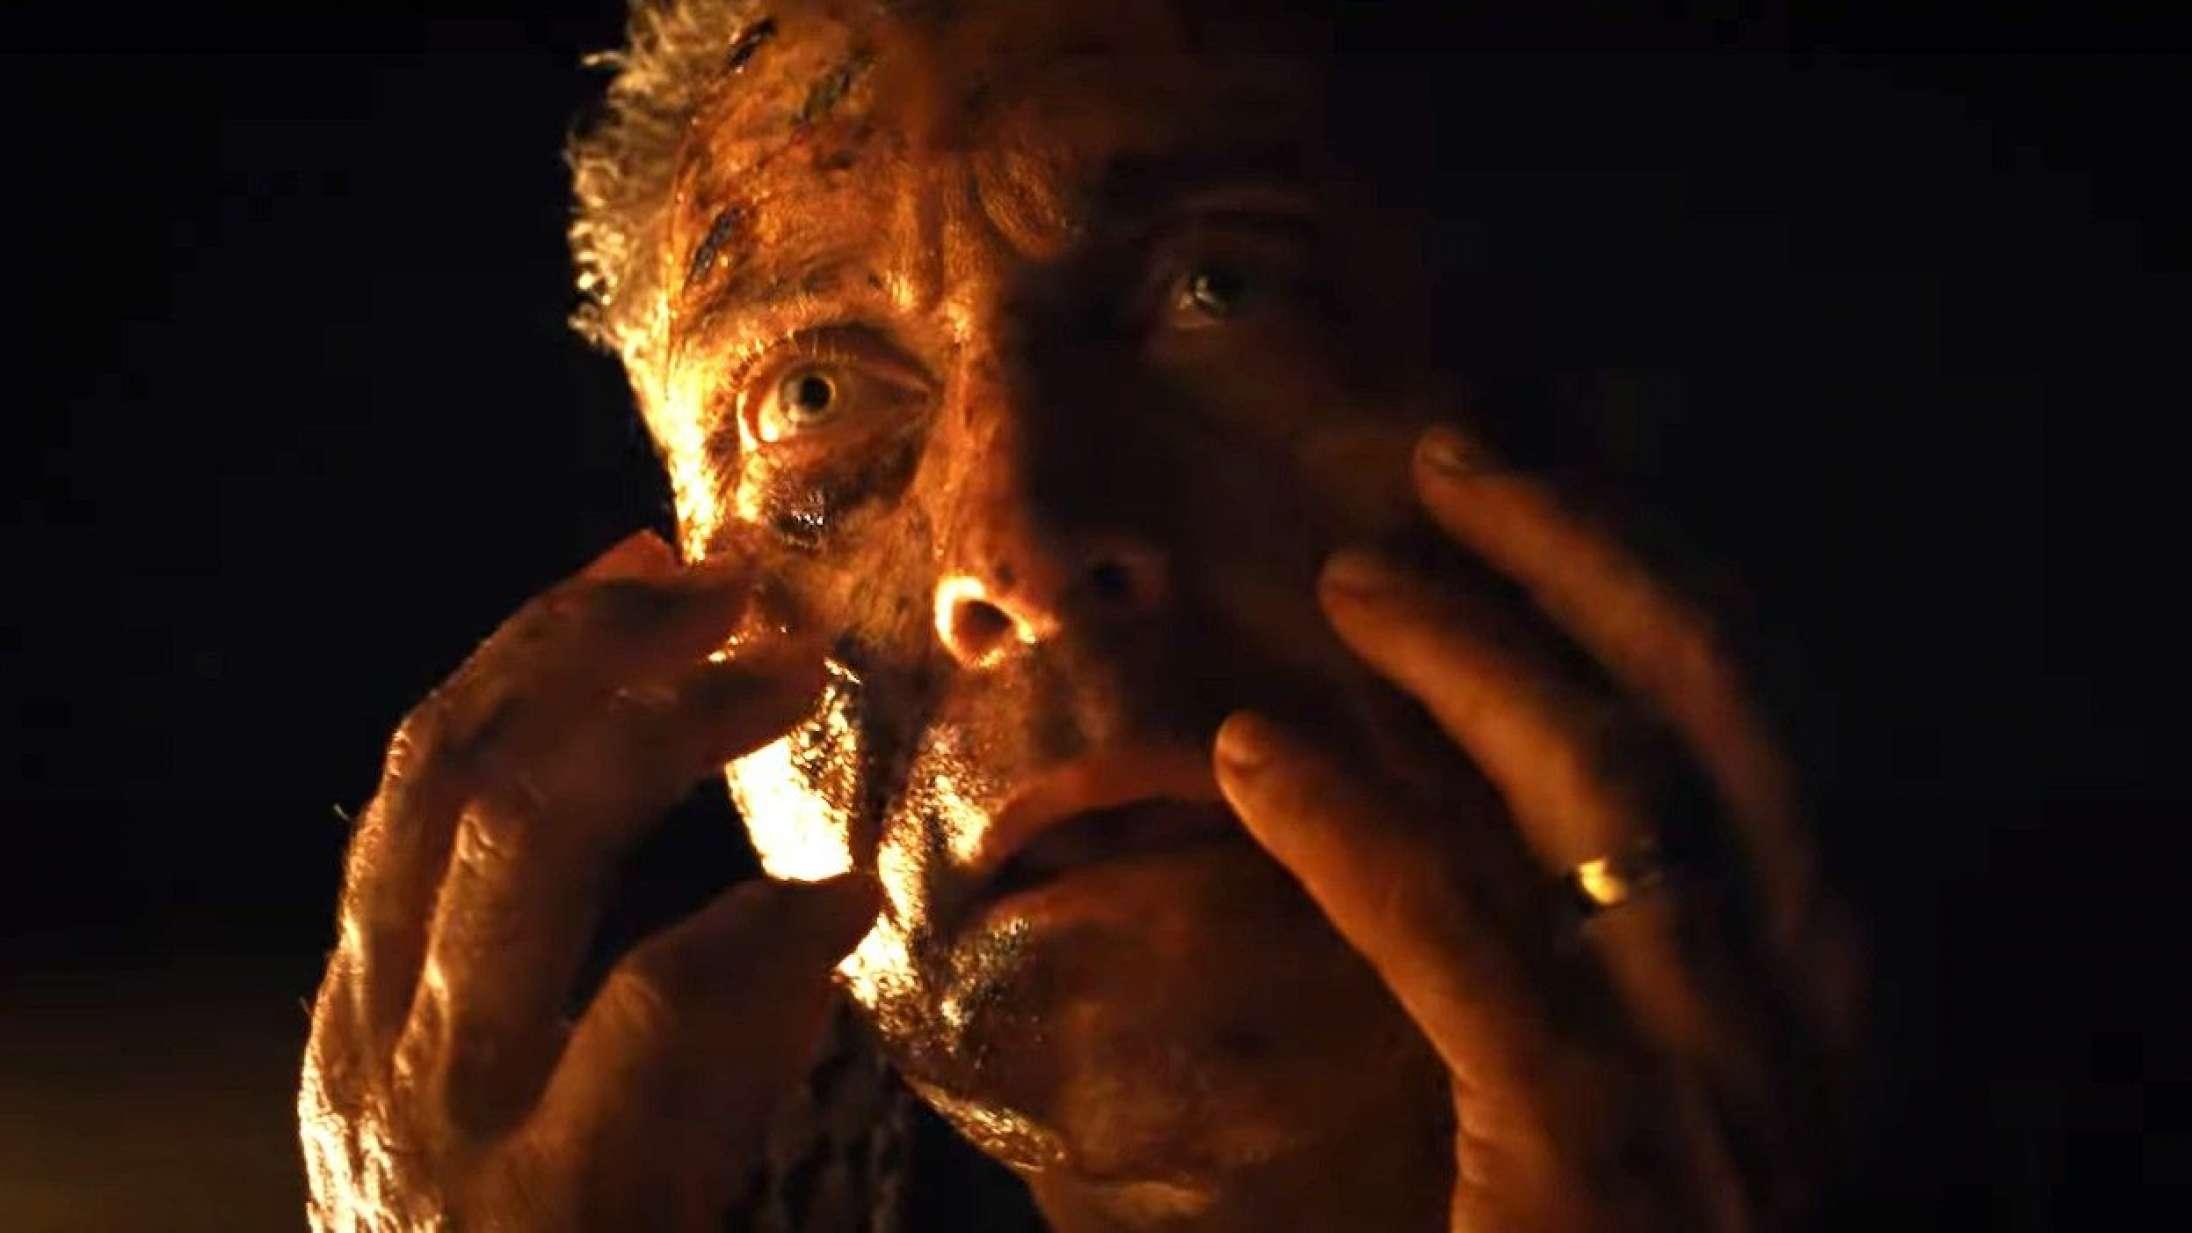 M. Night Shyamalans nye film kan blive hans mest creepy til dato: Se traileren til 'Old'